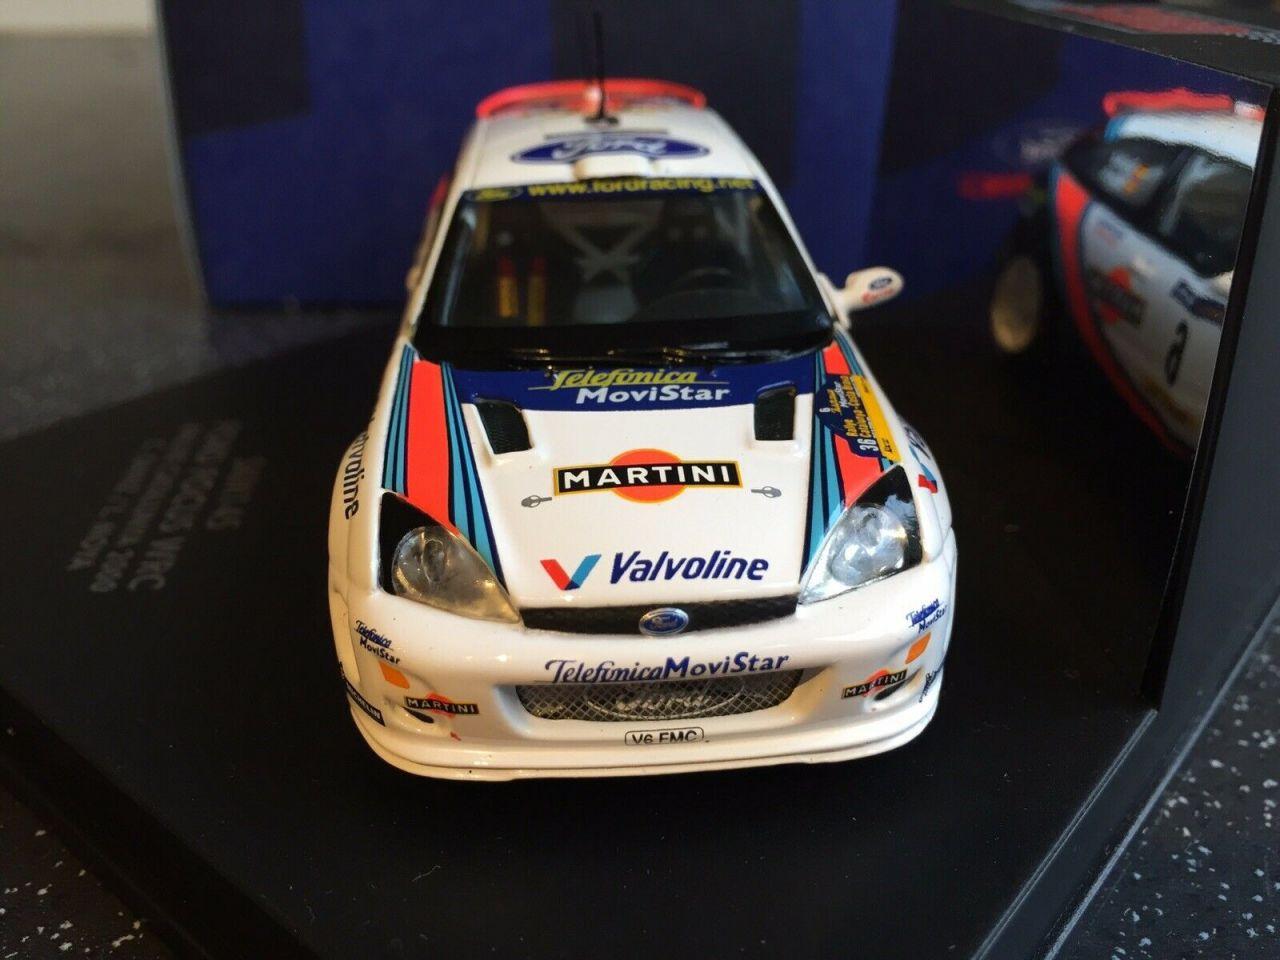 SKID SKM145 Ford Focus WRC Rallye Catalunya 2000 C.Sainz / L.Moya